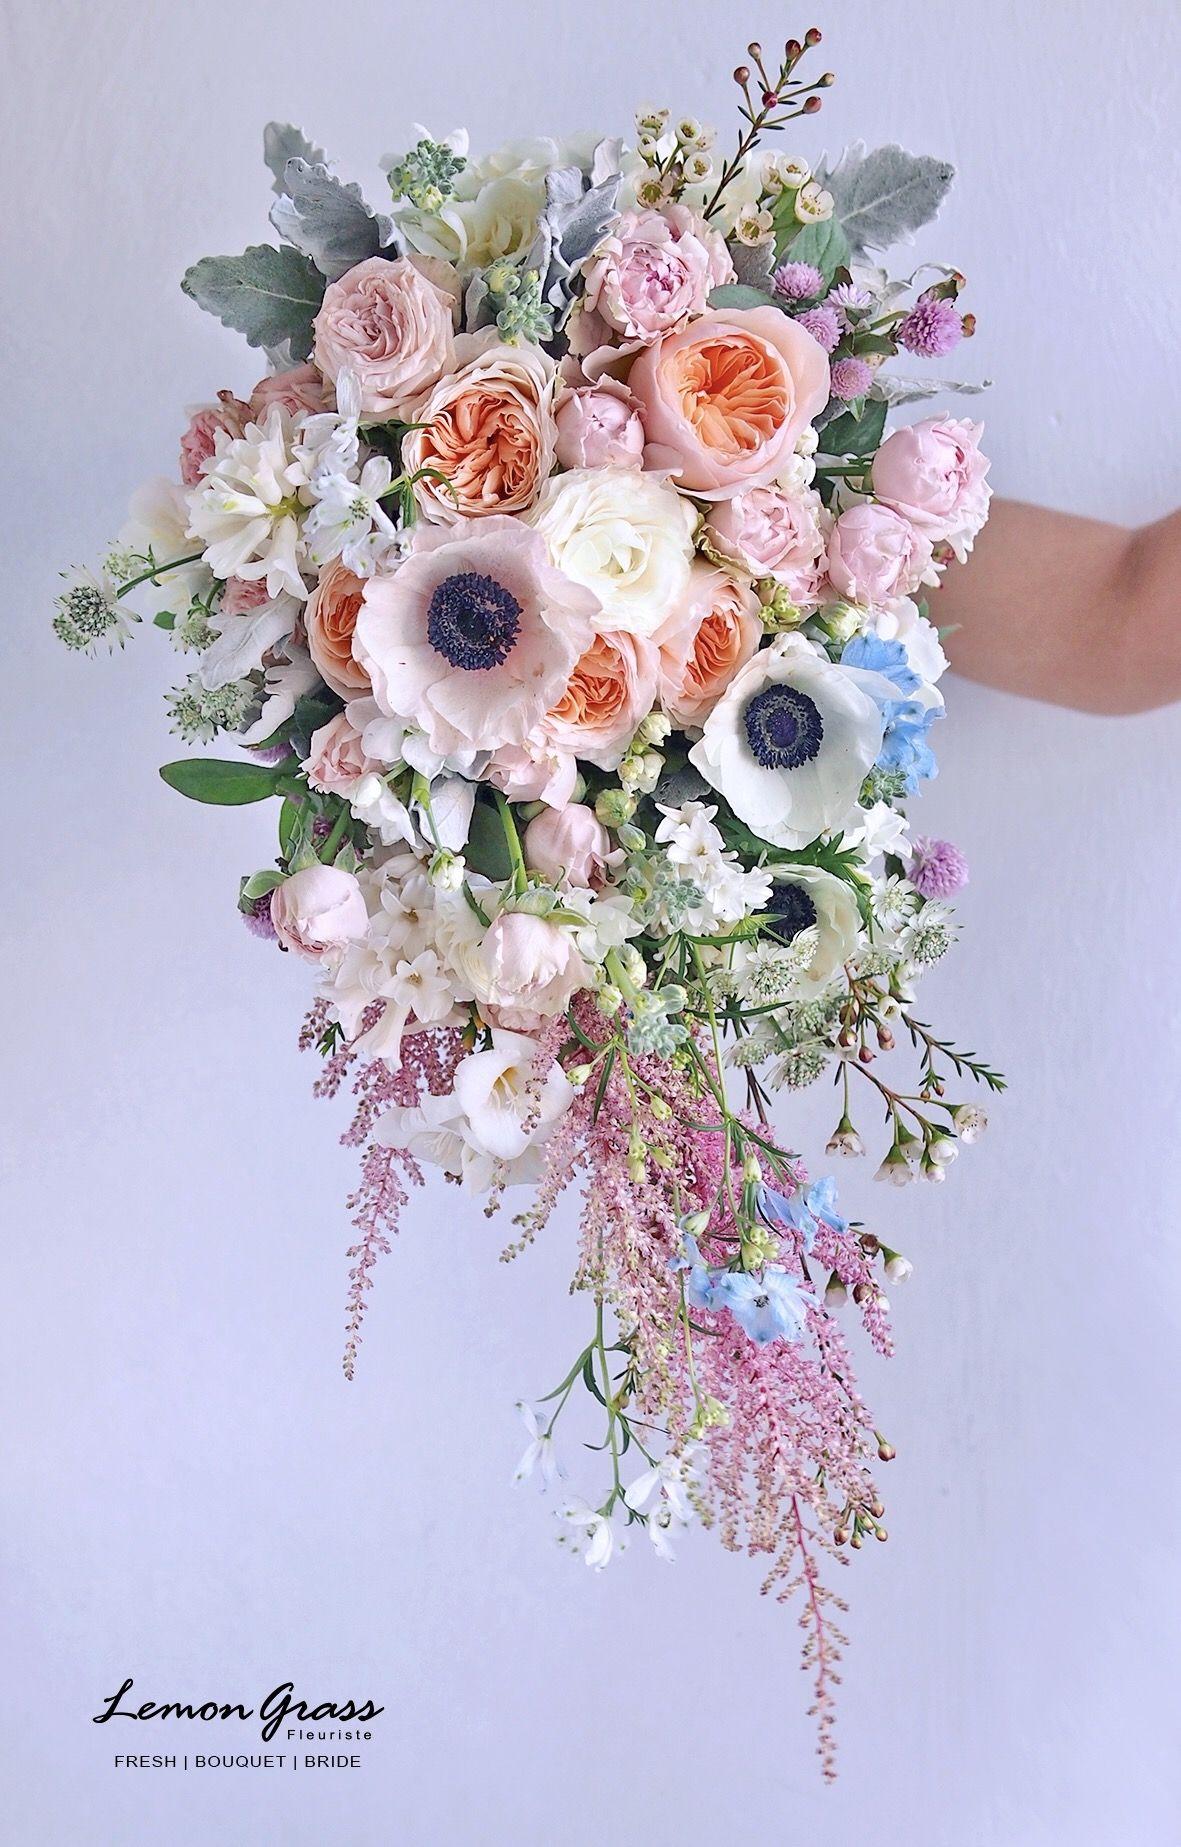 Pin by Allegra Lockstadt on Floral | Pinterest | Flowers, Flower ...